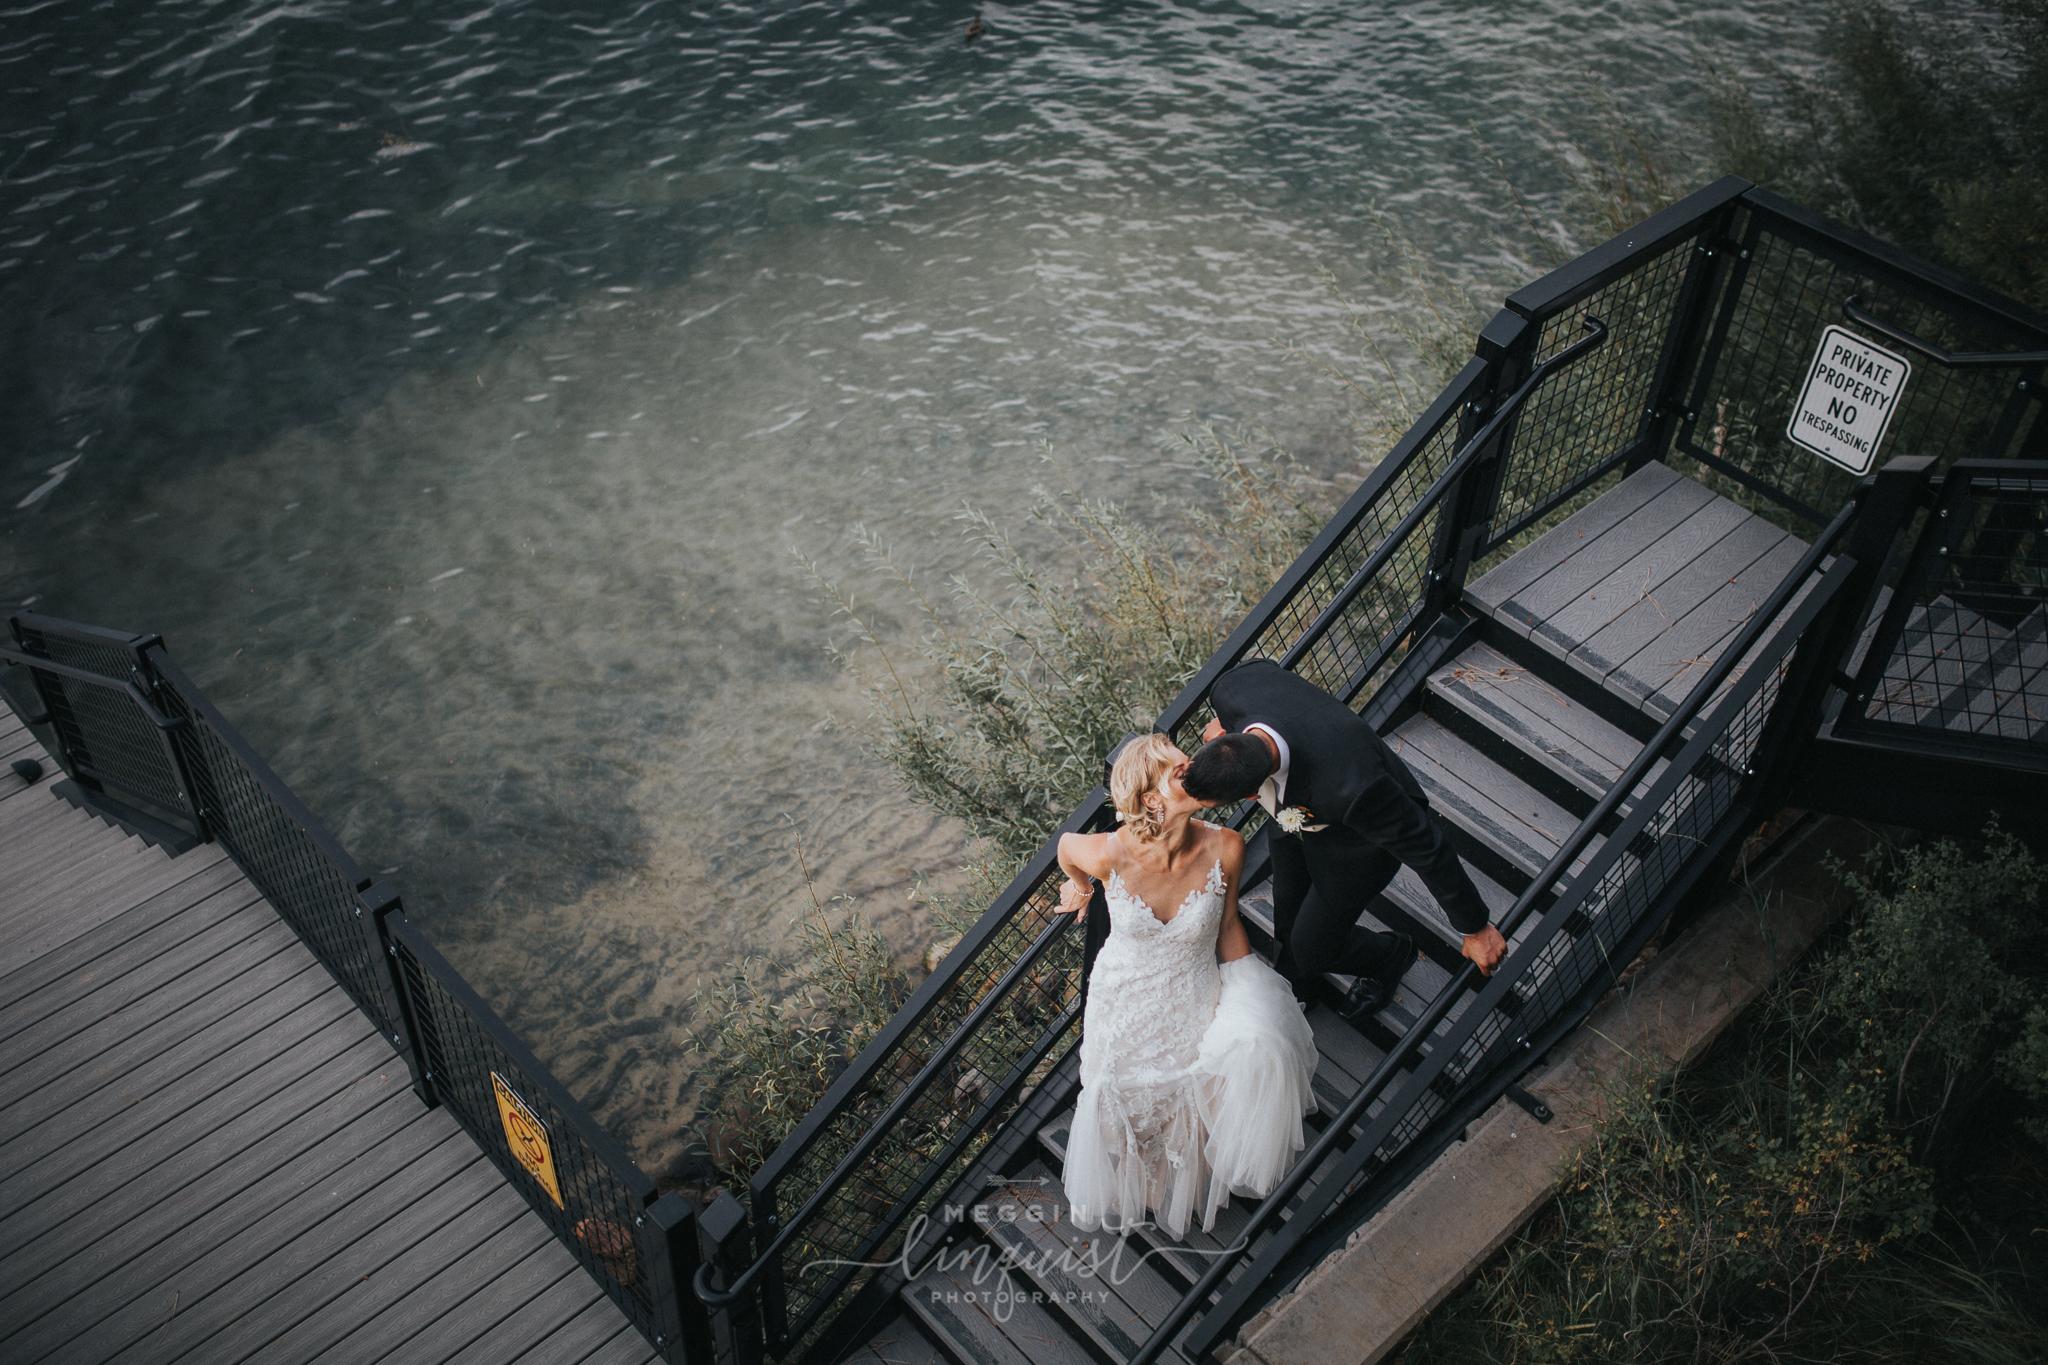 regan-beach-wedding-reno-lake-tahoe-wedding-photographer-49.jpg